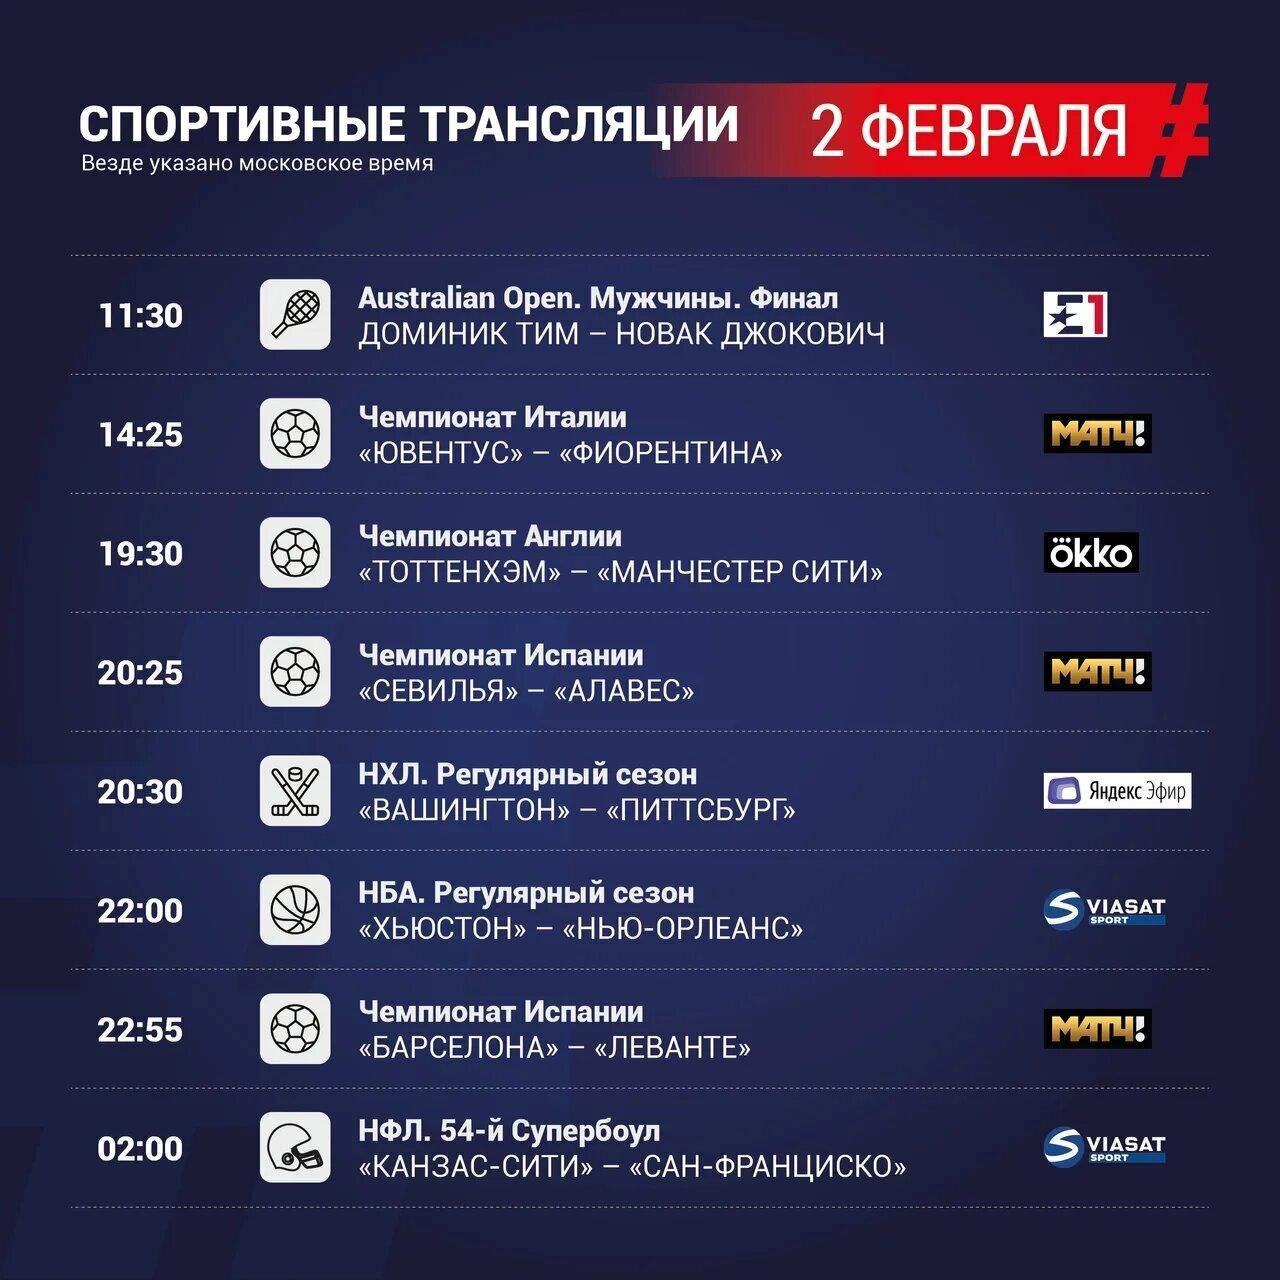 Спортивная телепрограмма Матч ТВ на 2 февраля